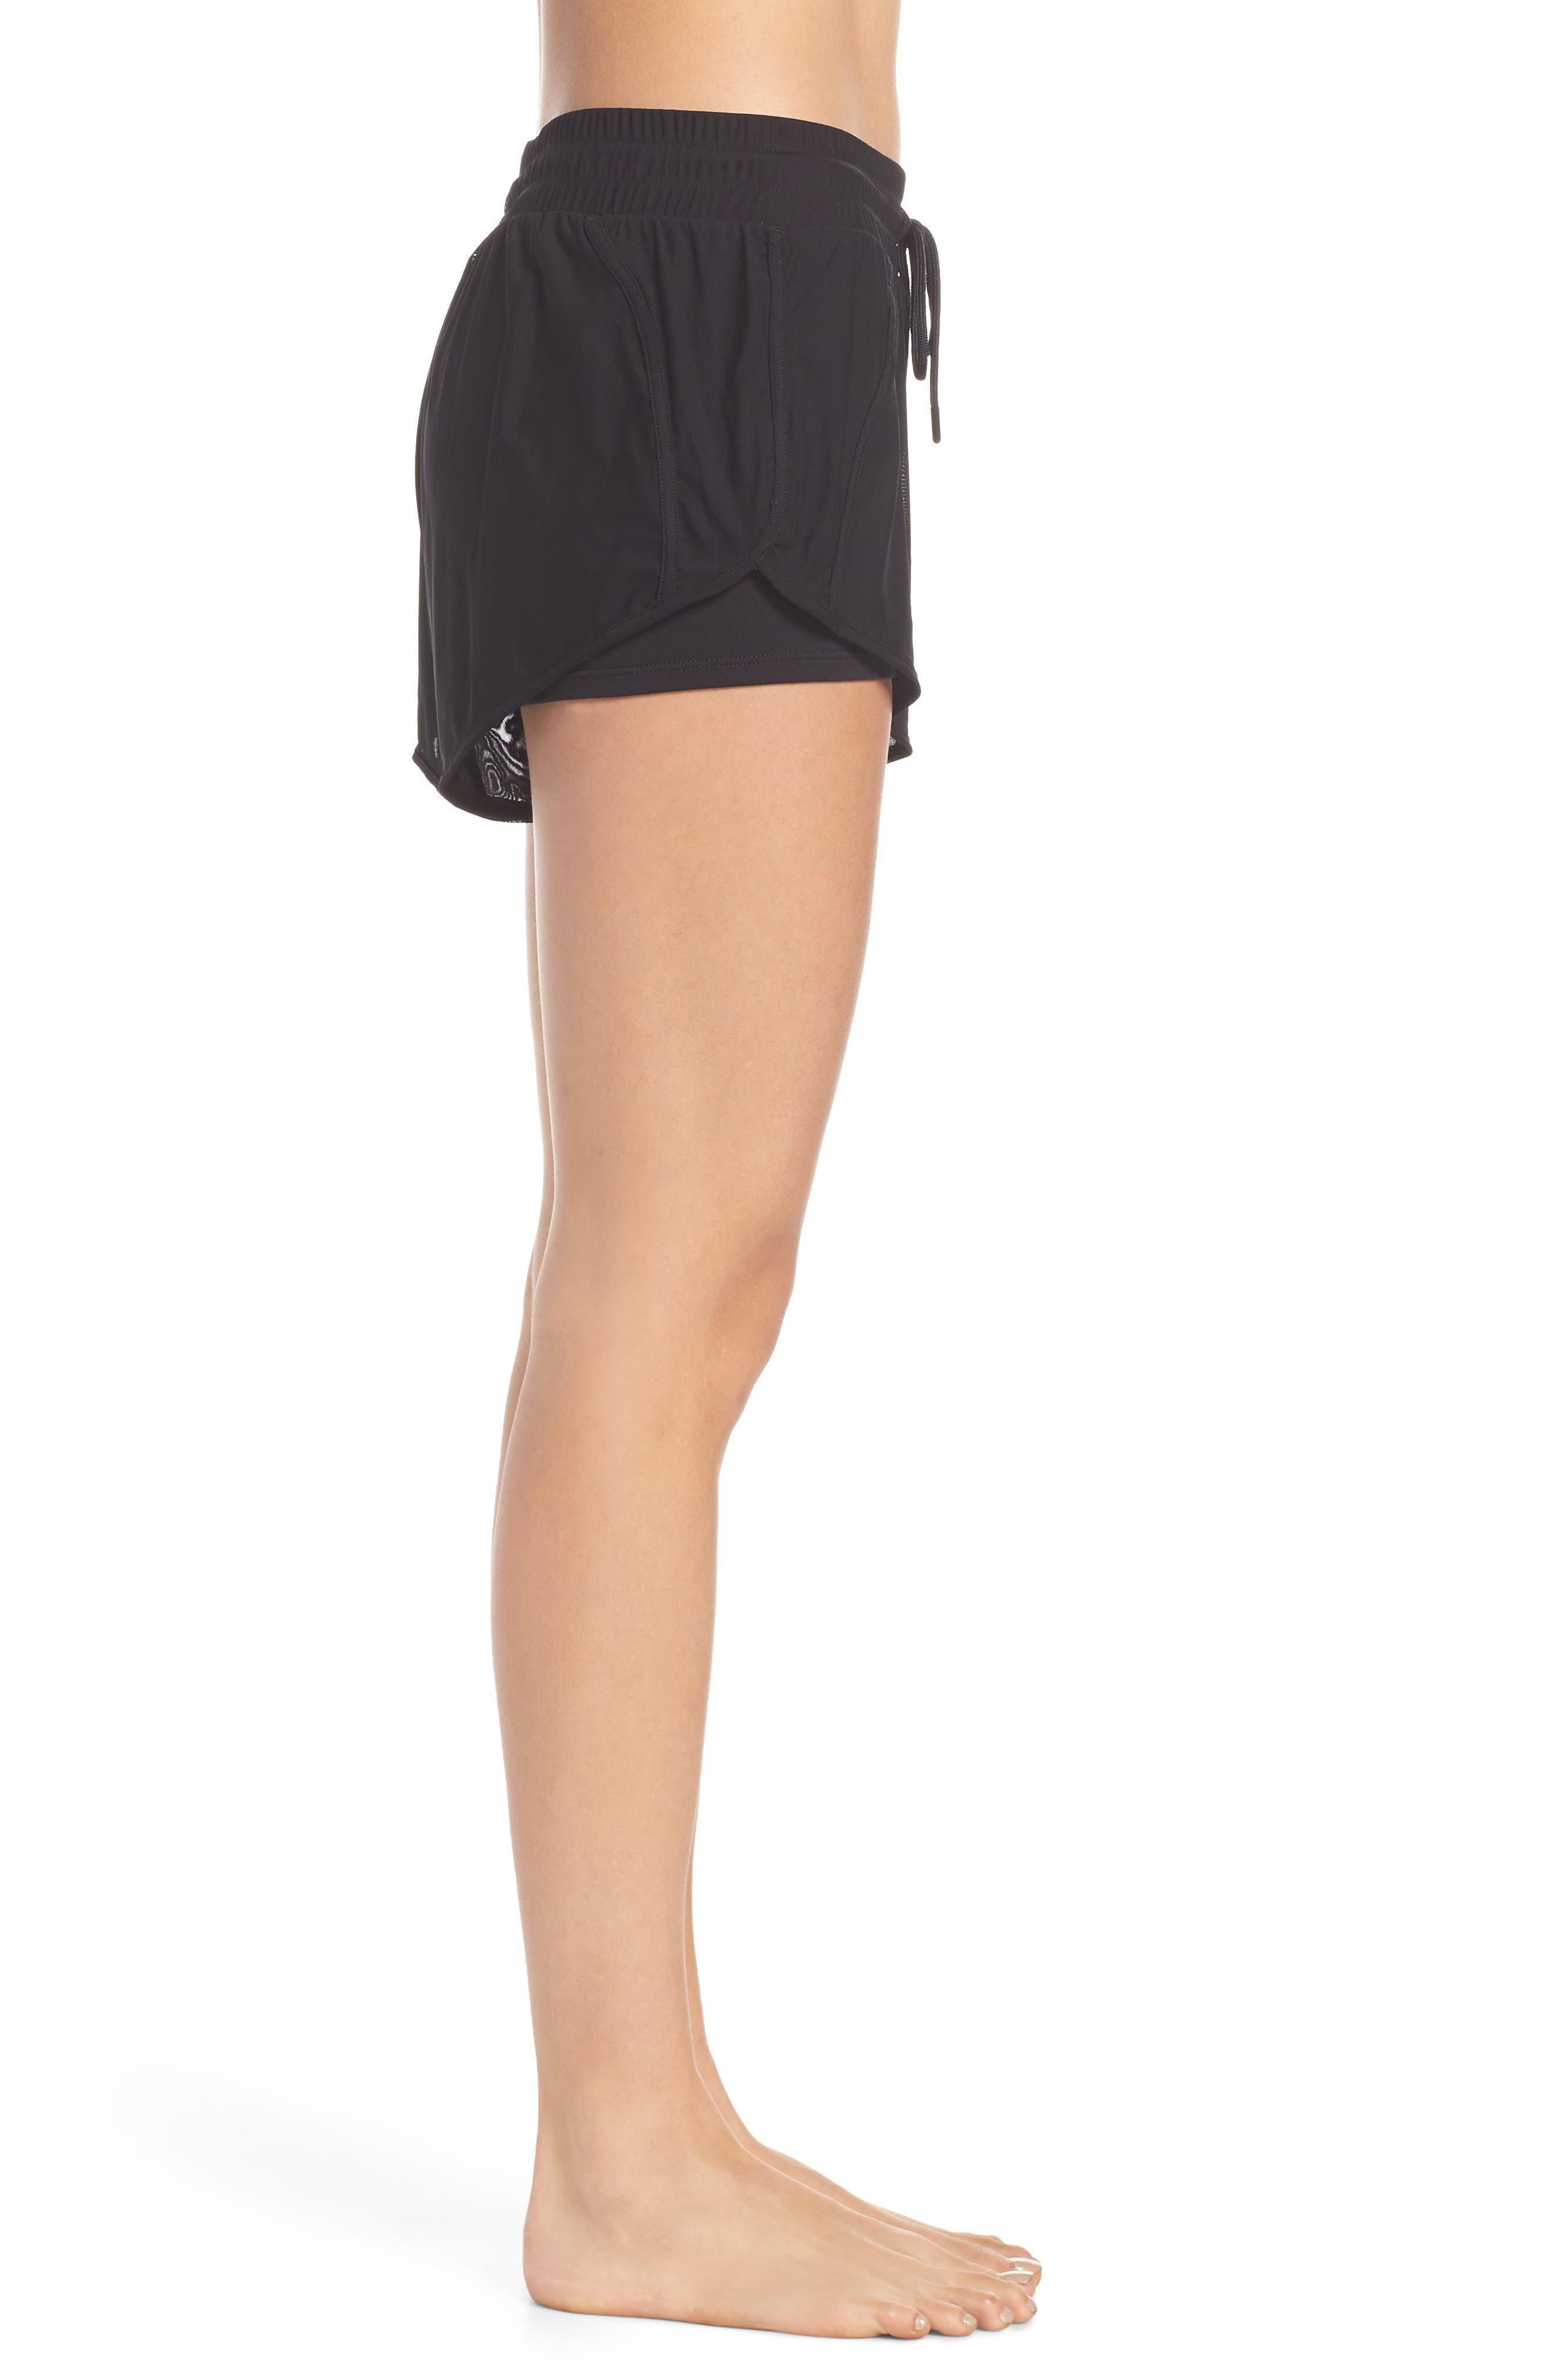 Ambience Shorts,                             Alternate thumbnail 3, color,                             BLACK/ BLACK/ ALO/ WHITE